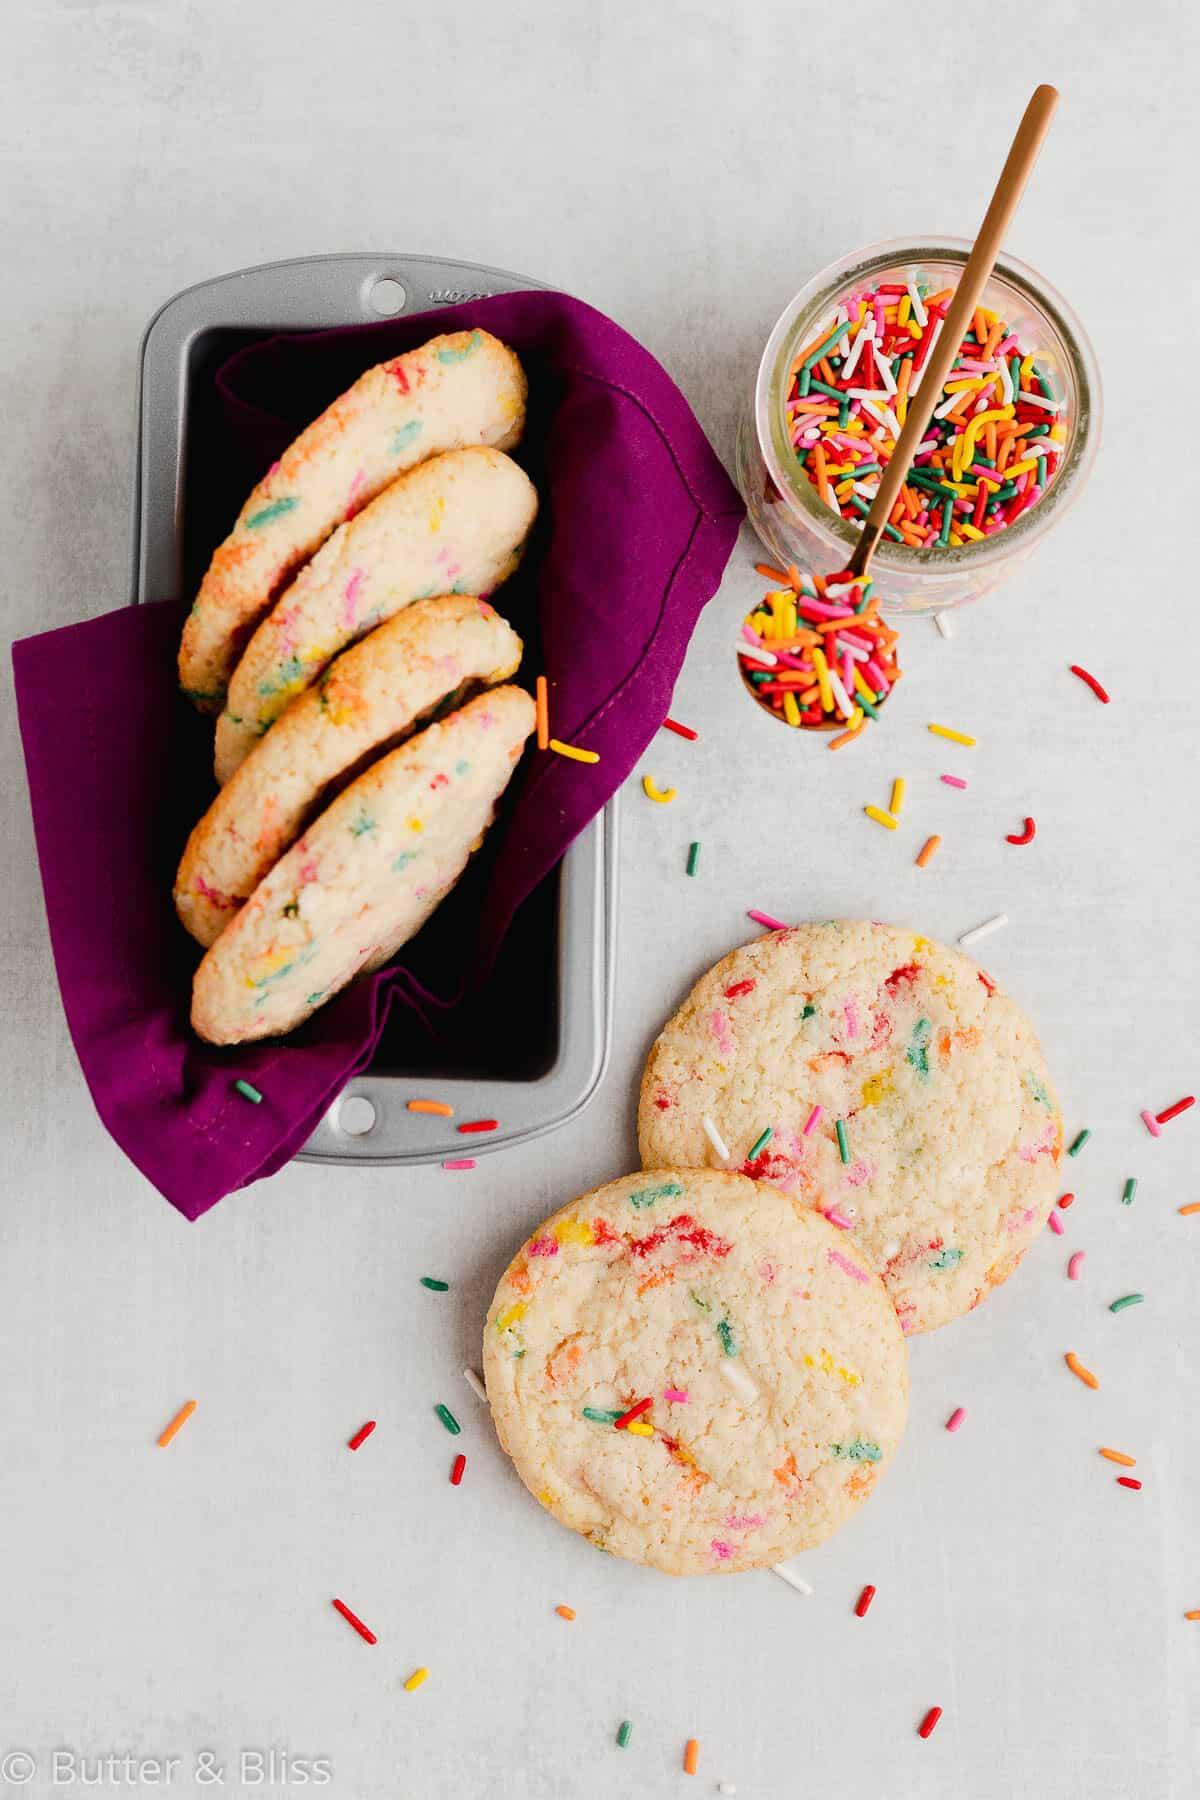 Sugar cookies with in a pan with a jar of sprinkles